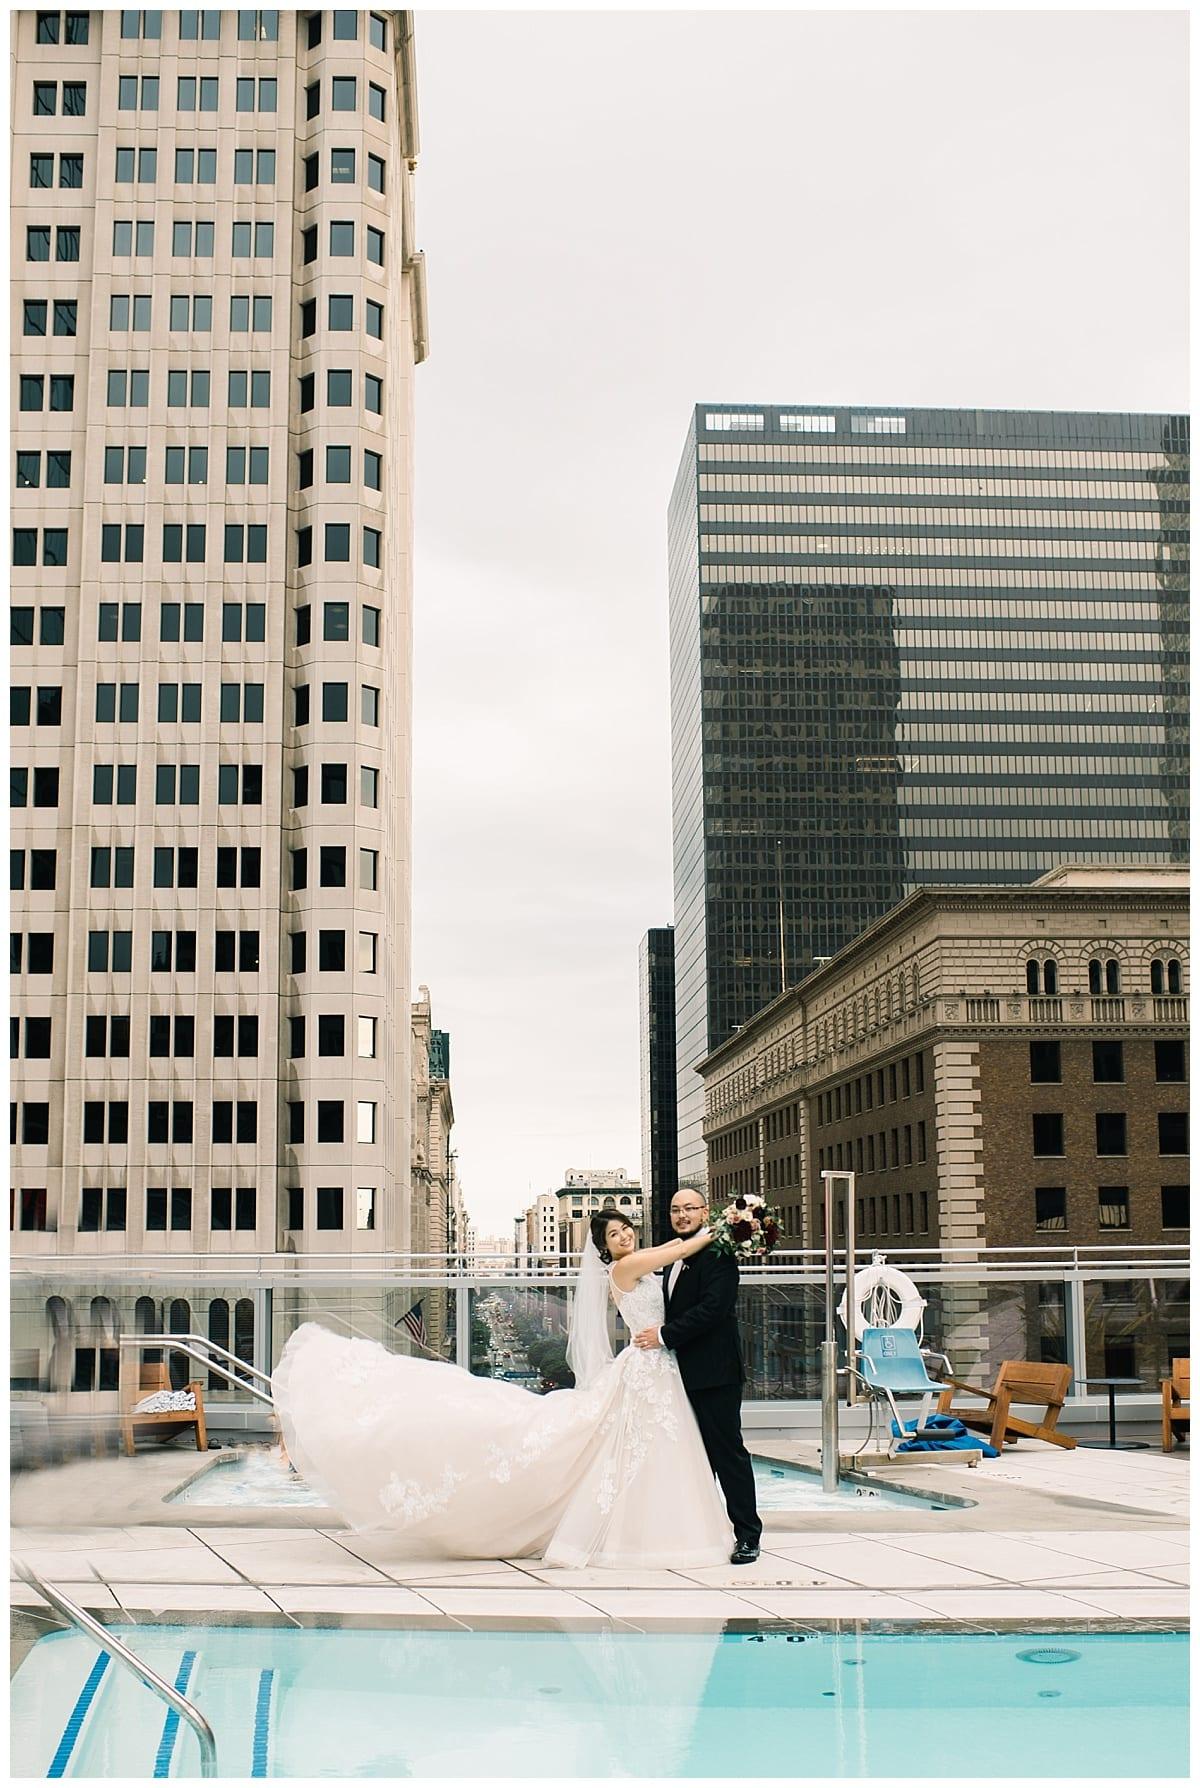 Intercontinental-Los-Angeles-Wedding-Carissa-Woo-Photography_0028.jpg